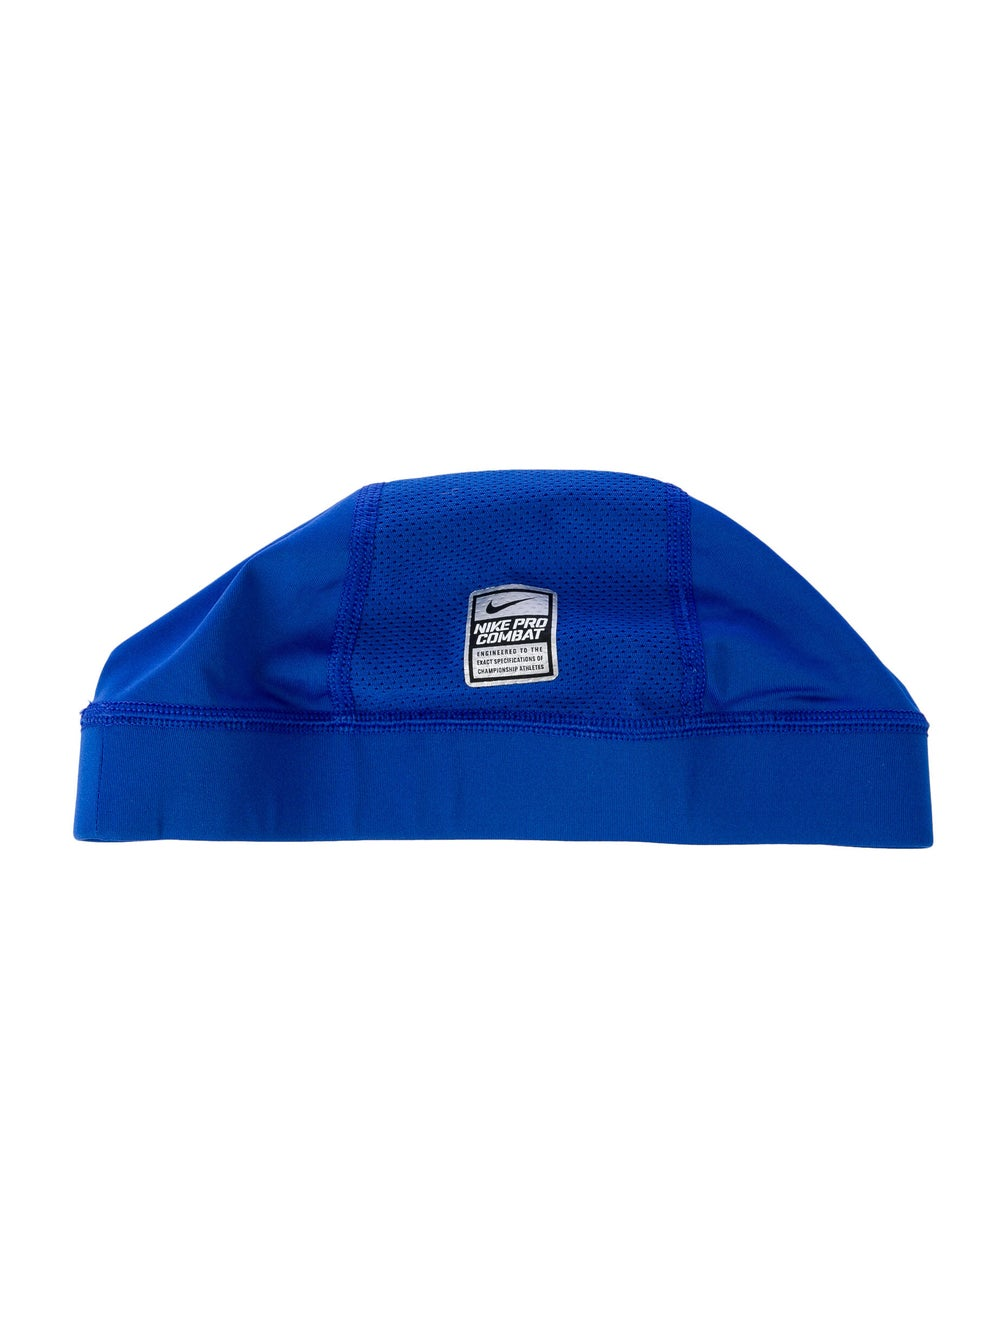 Nike Skull Cap blue - image 2